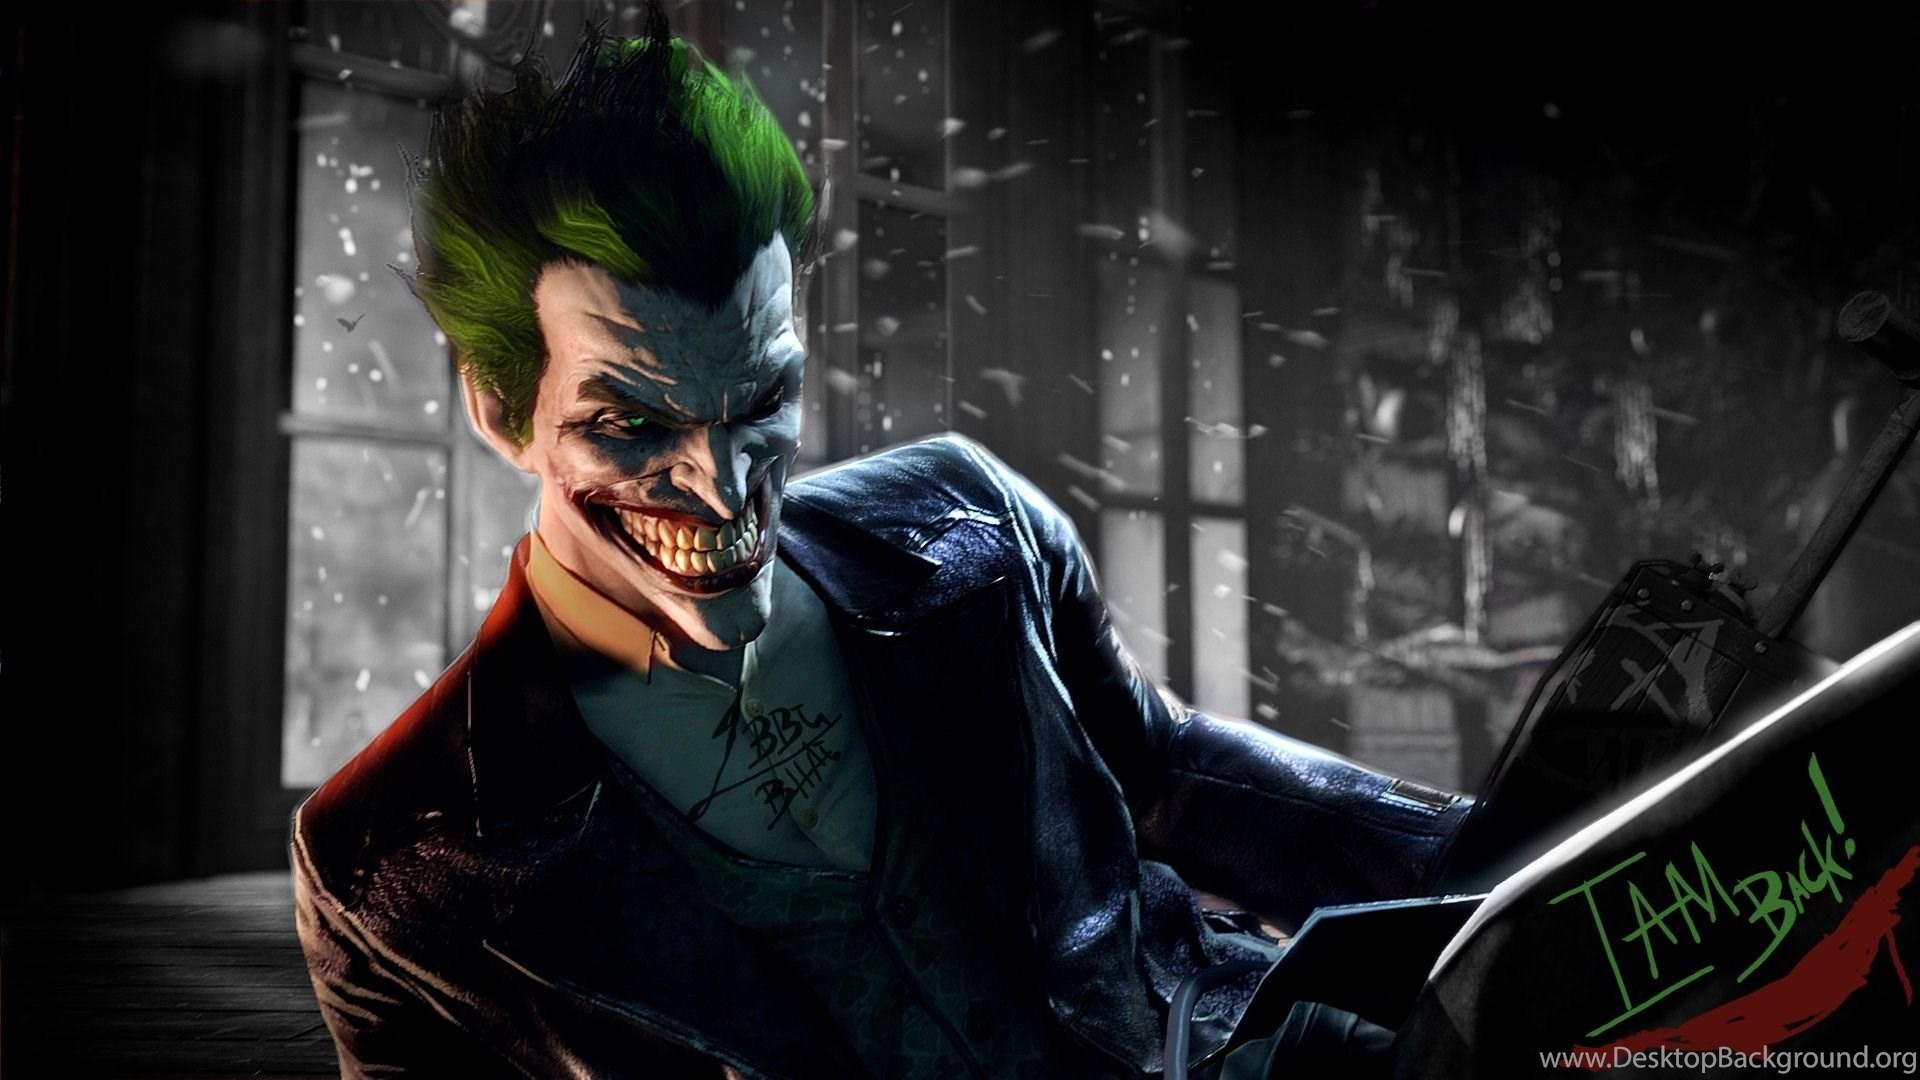 JokerI Am Back By Captthelegend On Desktop Background 1920x1080